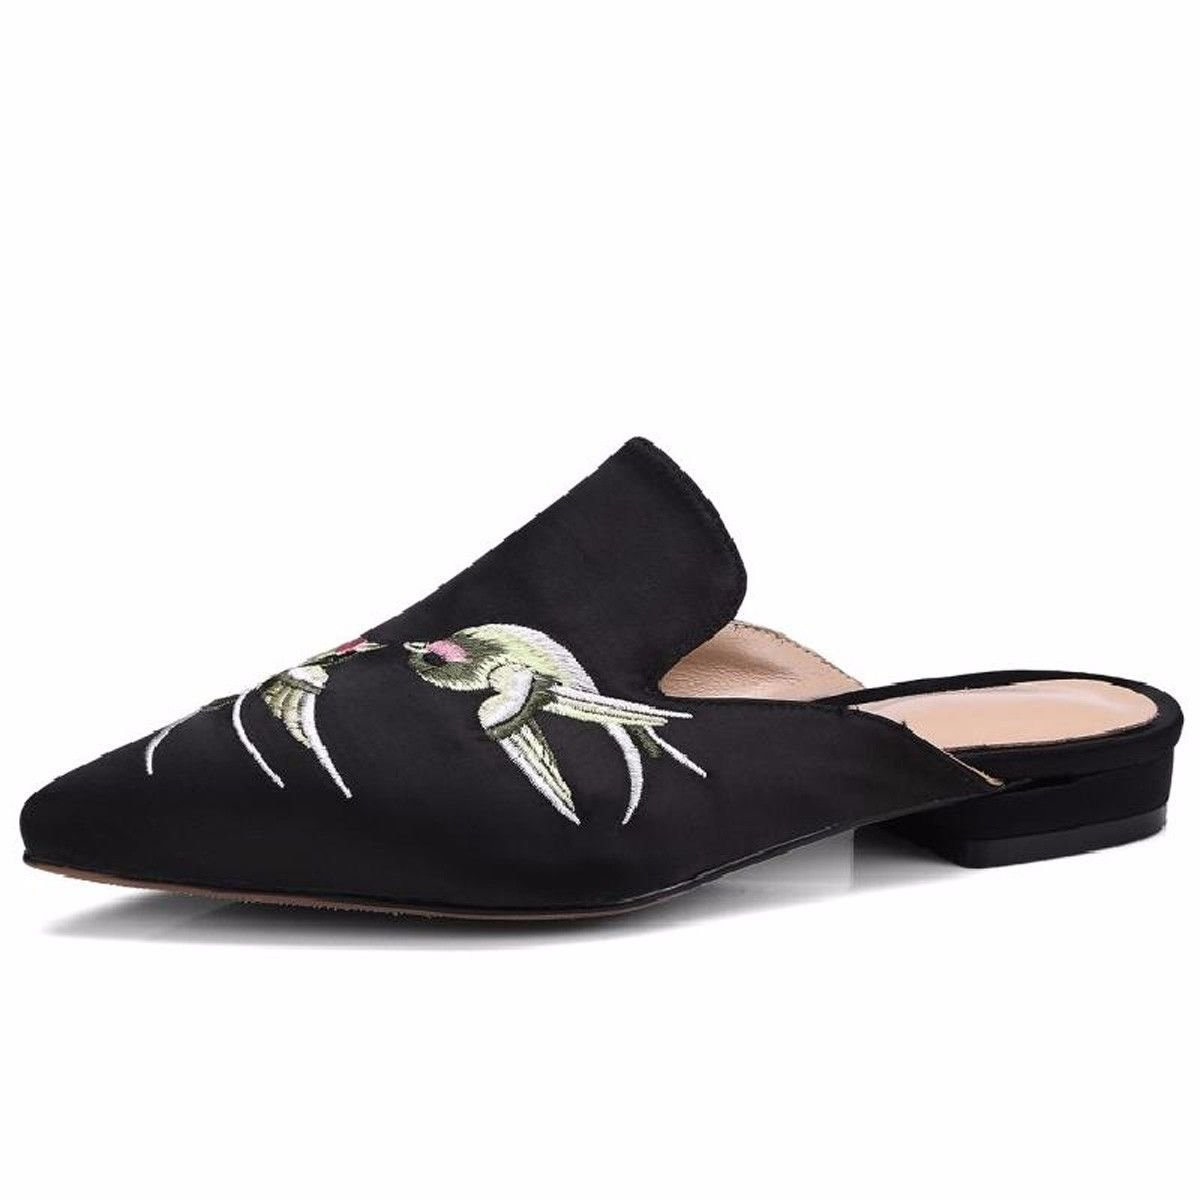 KPHY Bereits Im Sommer Schuhe Mode Sexy Sexy Sexy Satin Stickereien Damenschuhe Baotou Komfortable Wild Flachen Boden Coole Schuhe. 4ec5c2